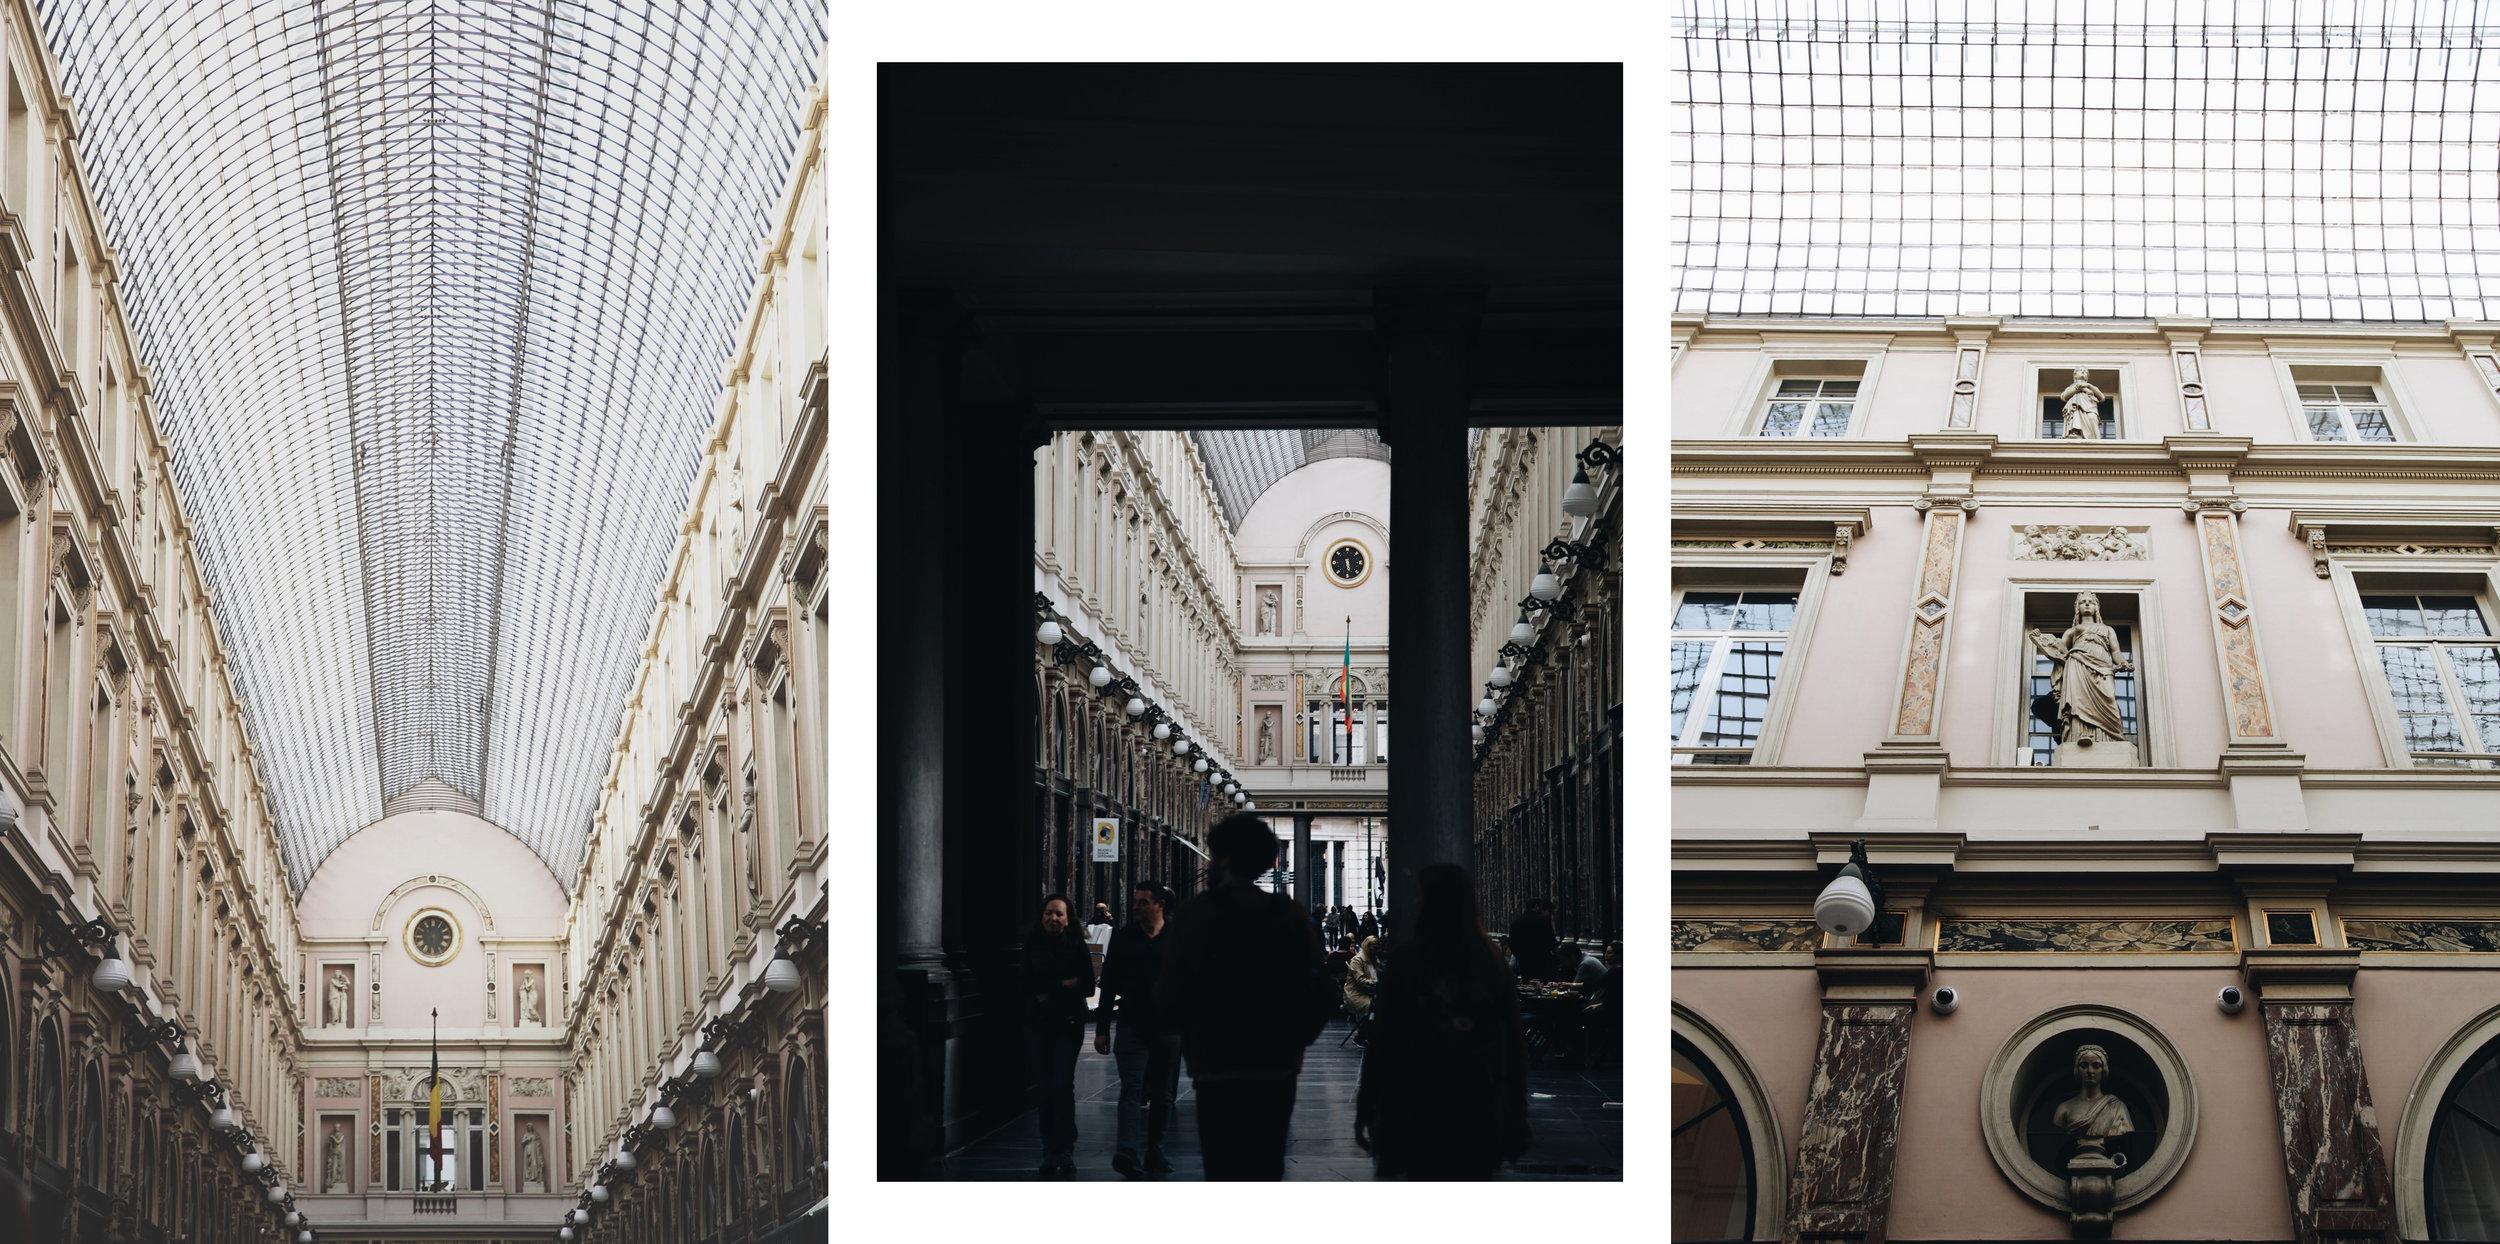 bruxelles-galeries-royales-voyage-belgique.JPG